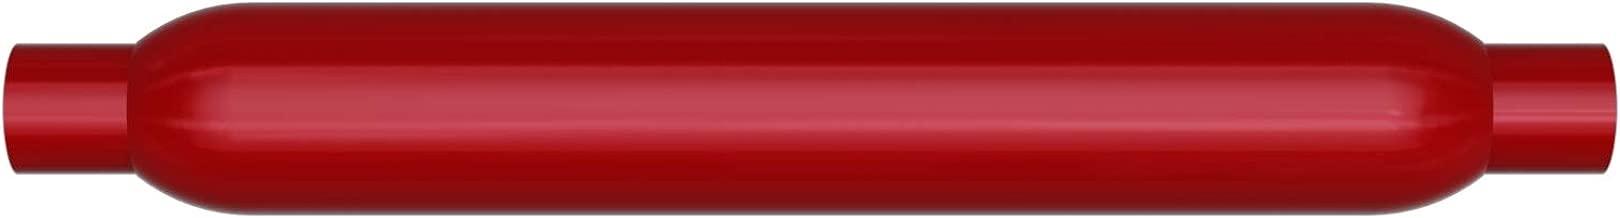 MagnaFlow 13146 Muffler